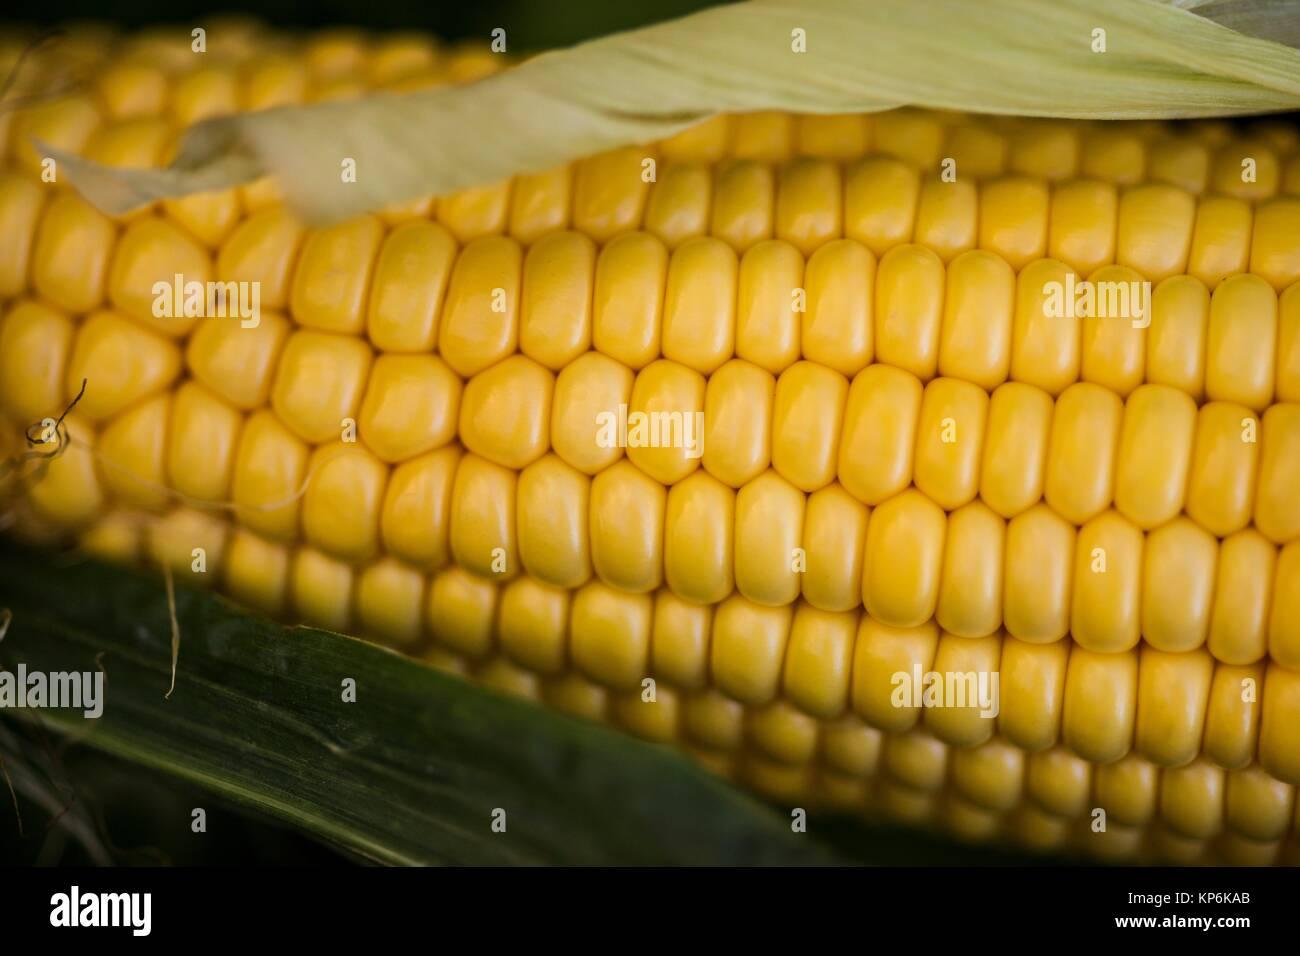 Ear of corn (maize, Zea mays). - Stock Image